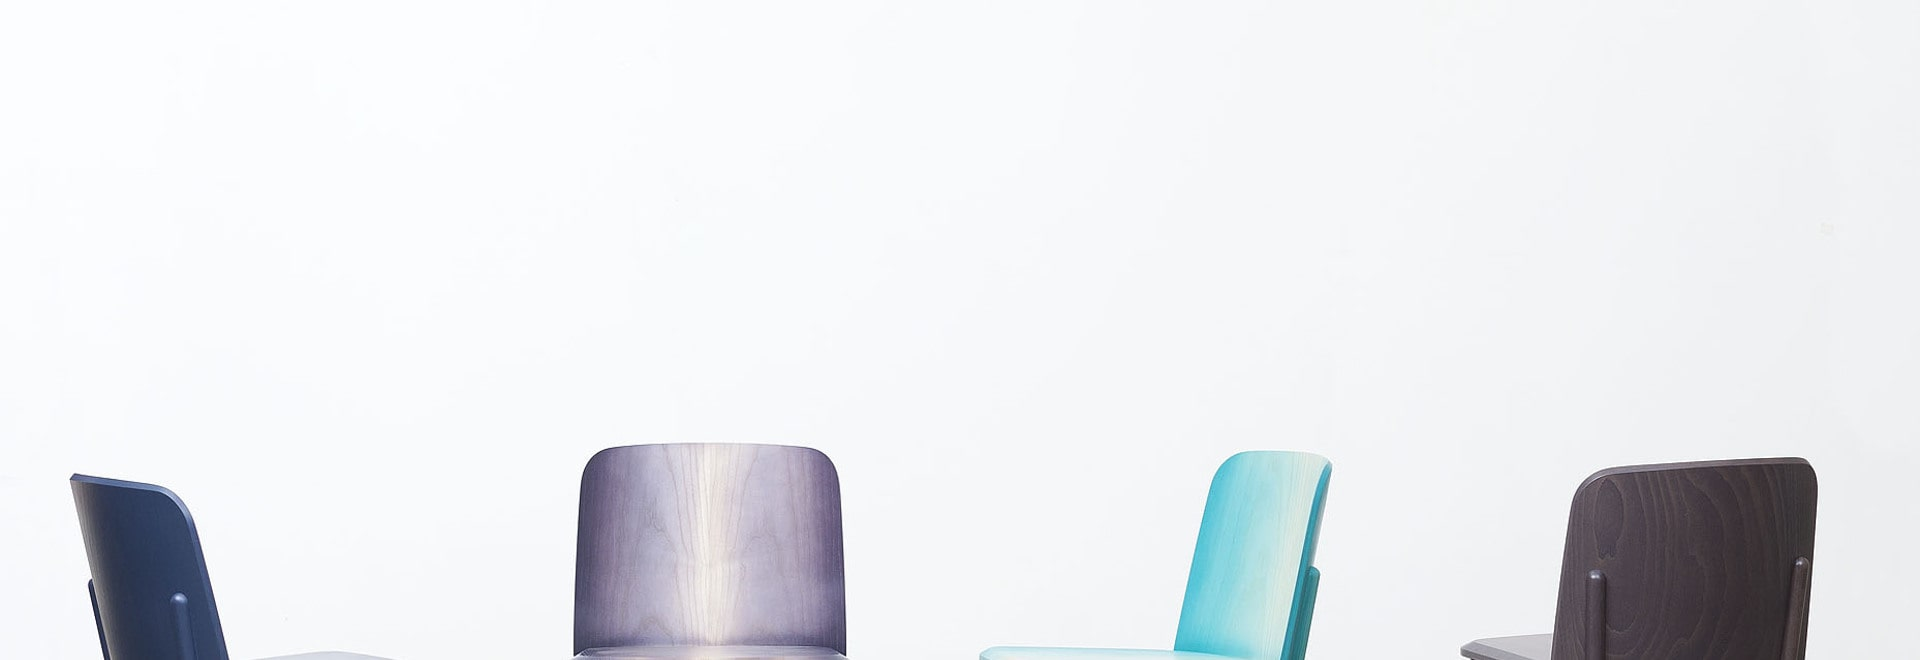 MILAN 2015: ARIK LEVY PUSHES THE BOUNDARIES OF WOOD-BENDING WITH SPLIT CHAIR